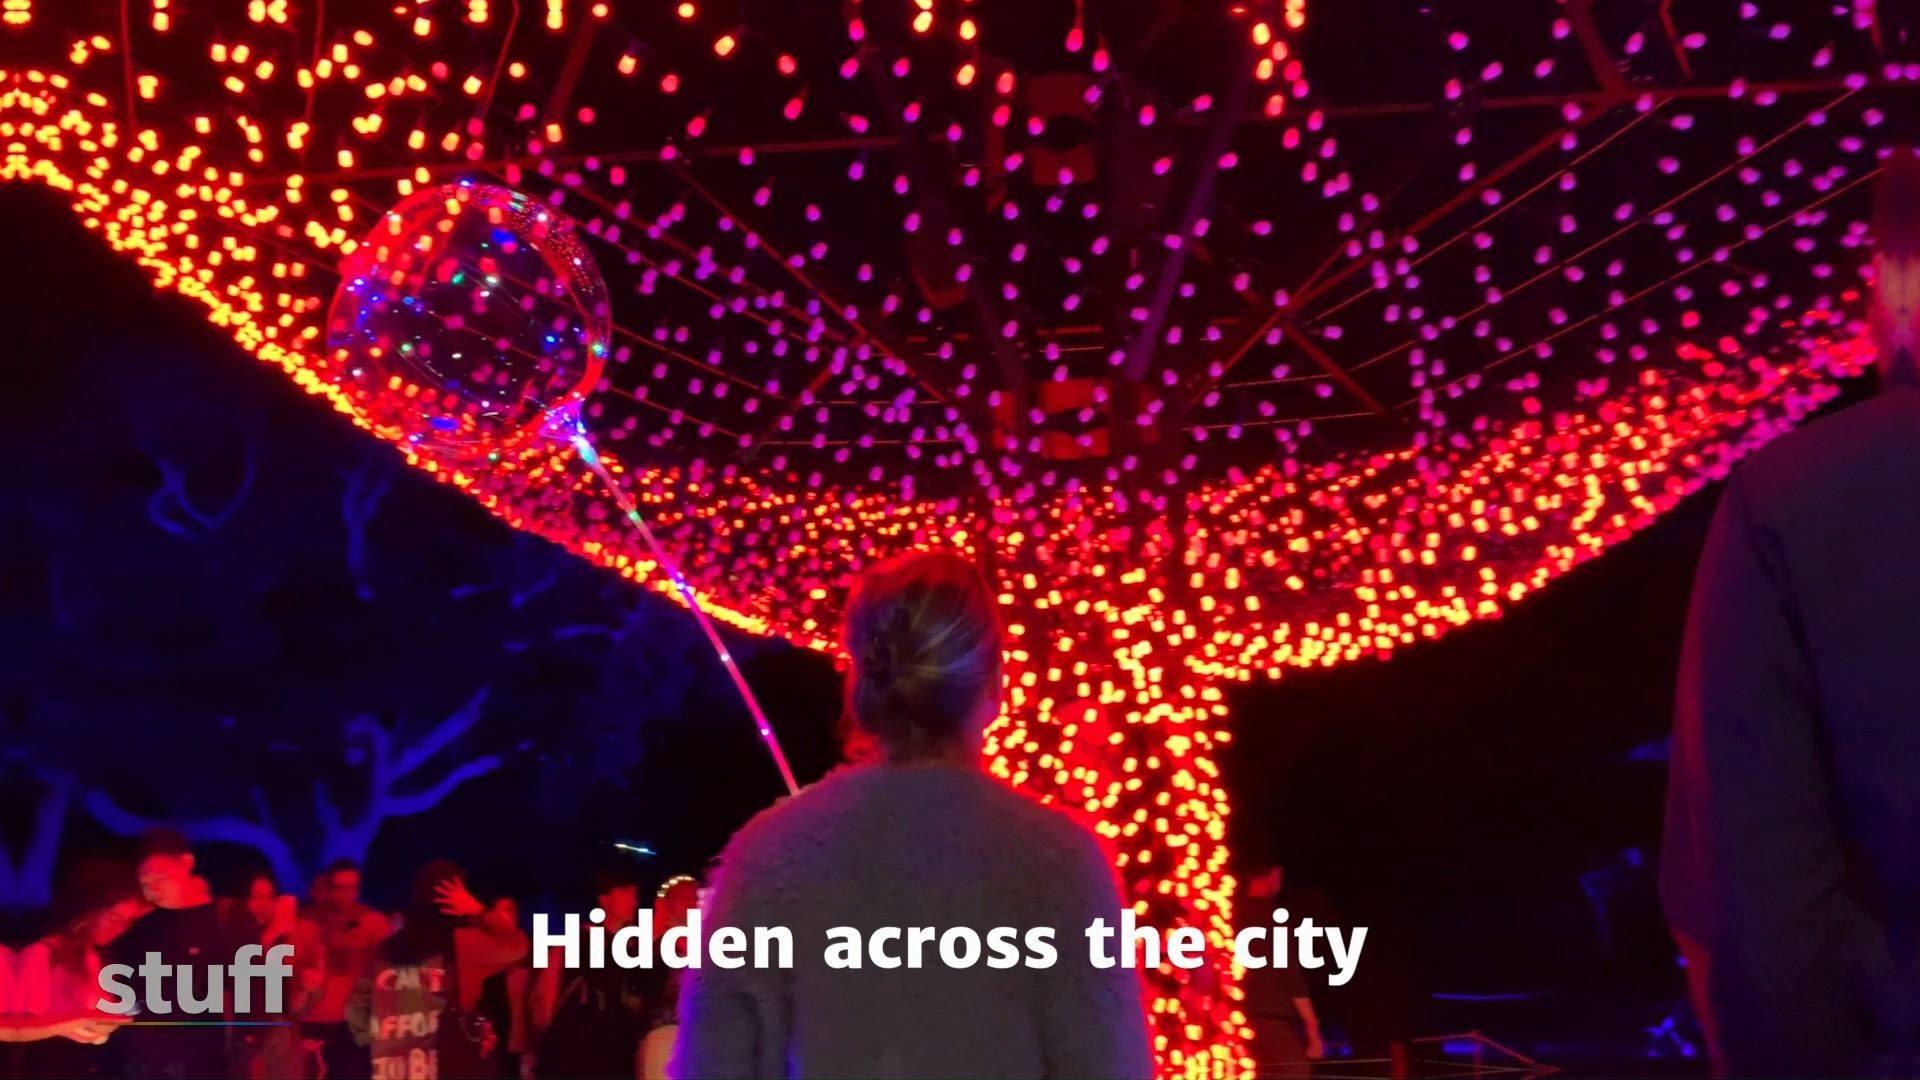 Inside Sydney's Vivid festival